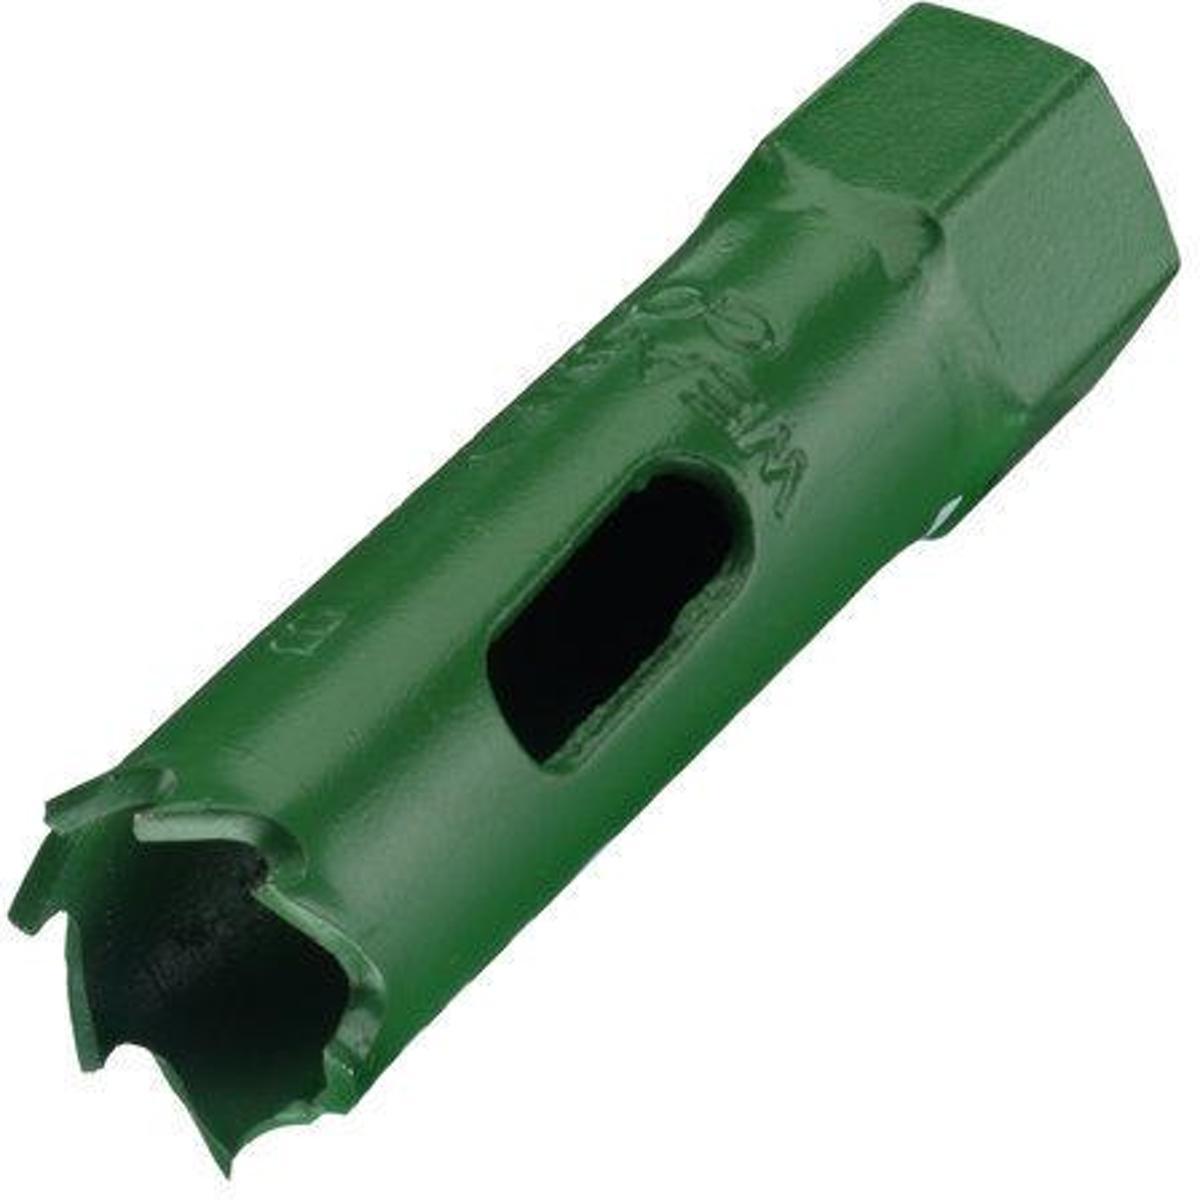 Hitachi Gatzaag bi-metaal  752105    20mm 25/32inch kopen